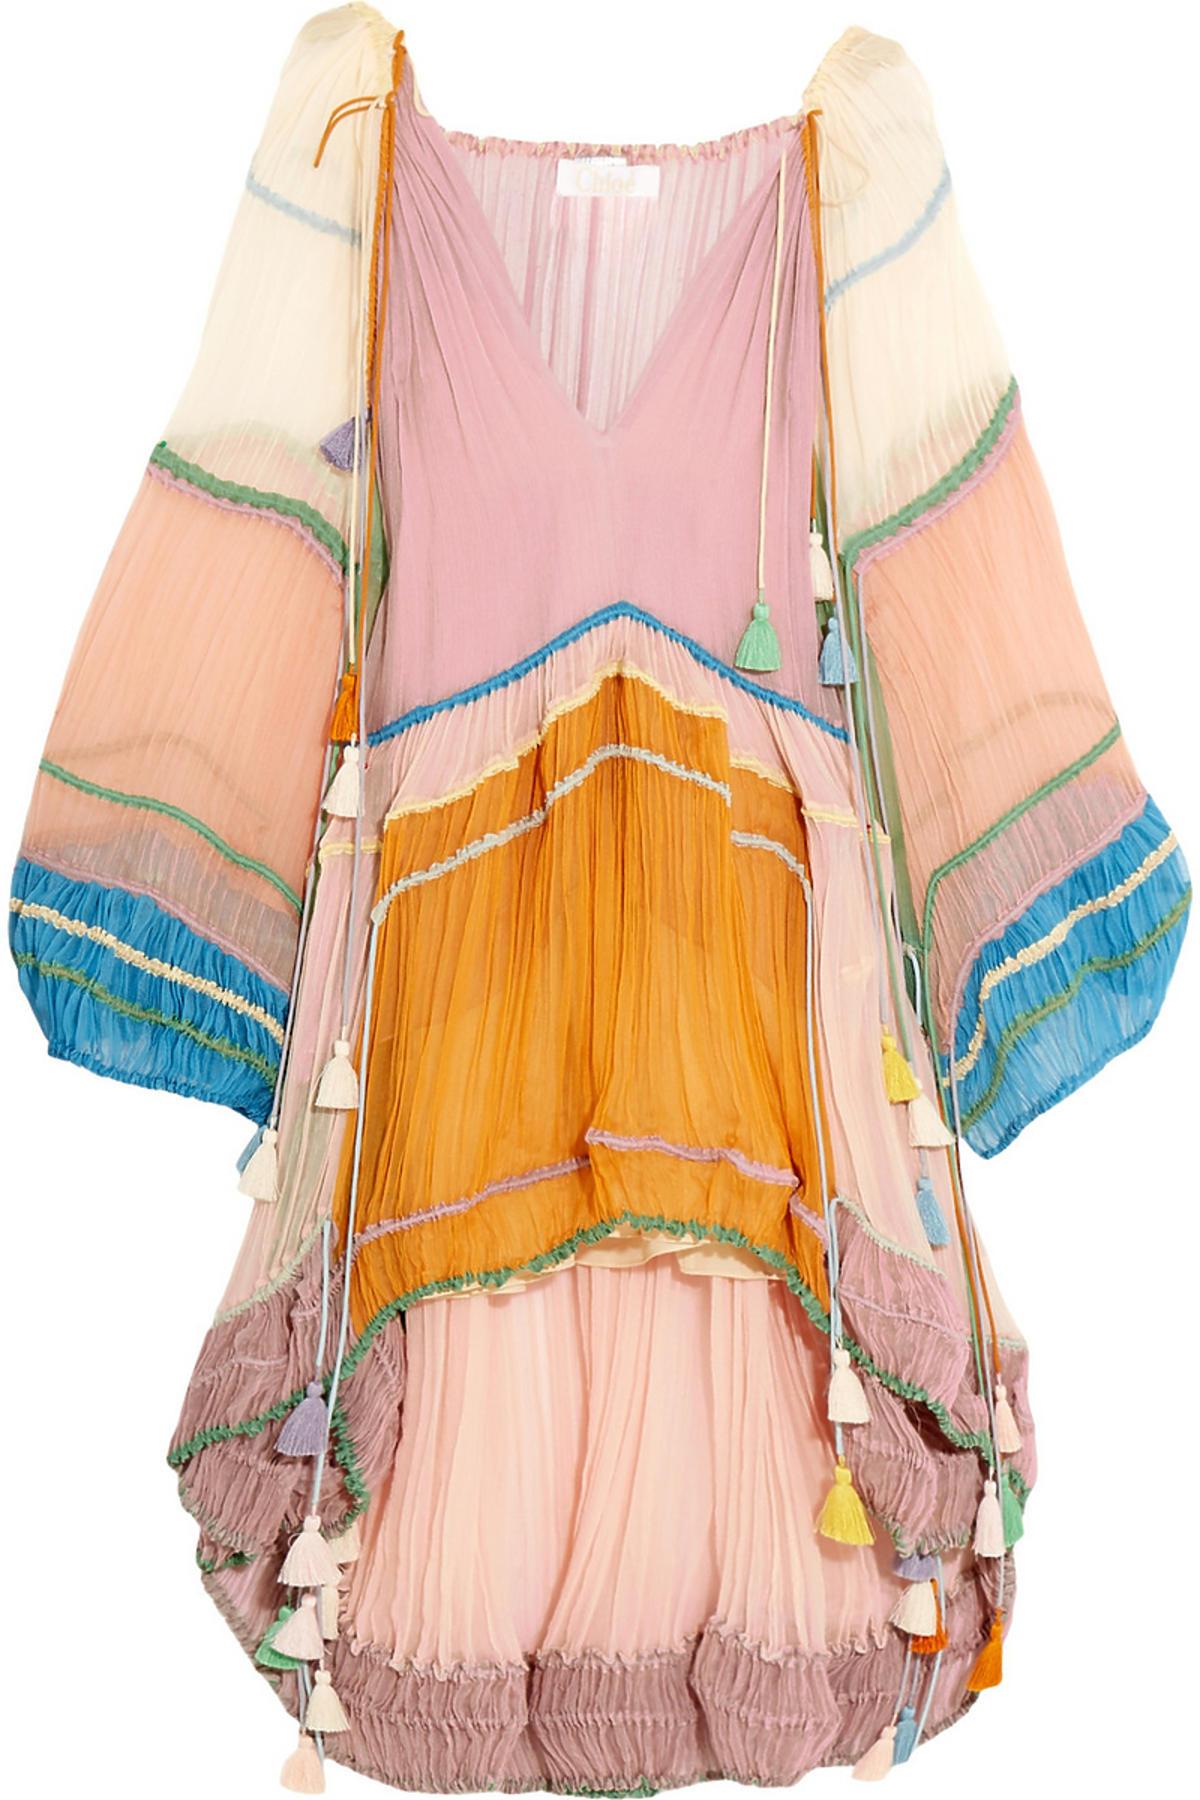 Kolorowa sukienka Chloe